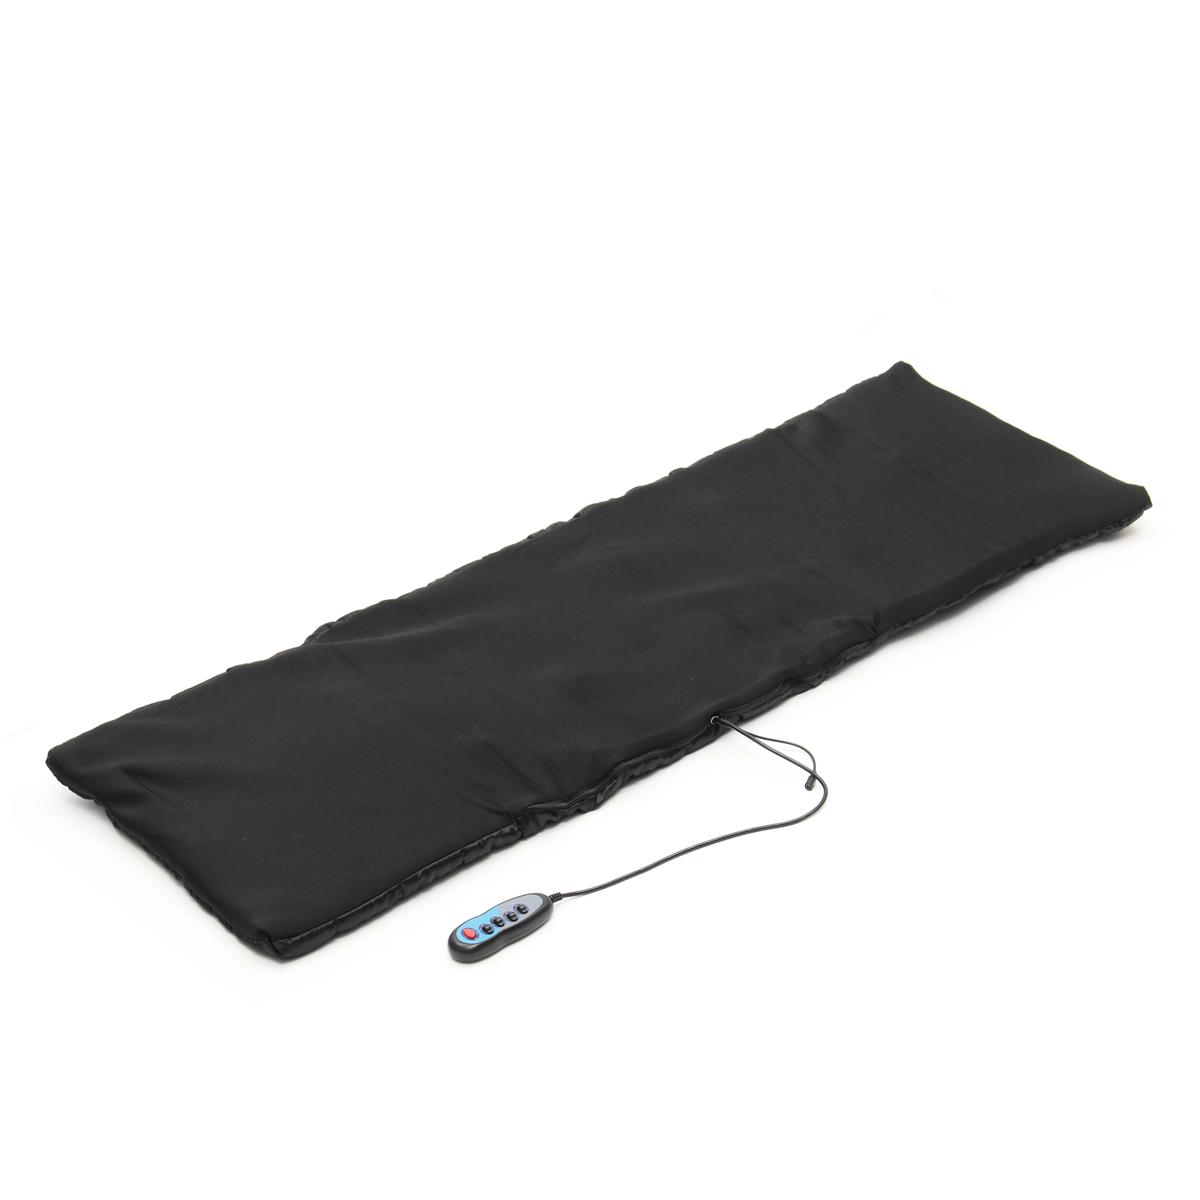 Body Massage Mattress Heated Massager With Remote Control Cushion Foldable Full Body Cushion Sofa Bed Spa Massager Machine